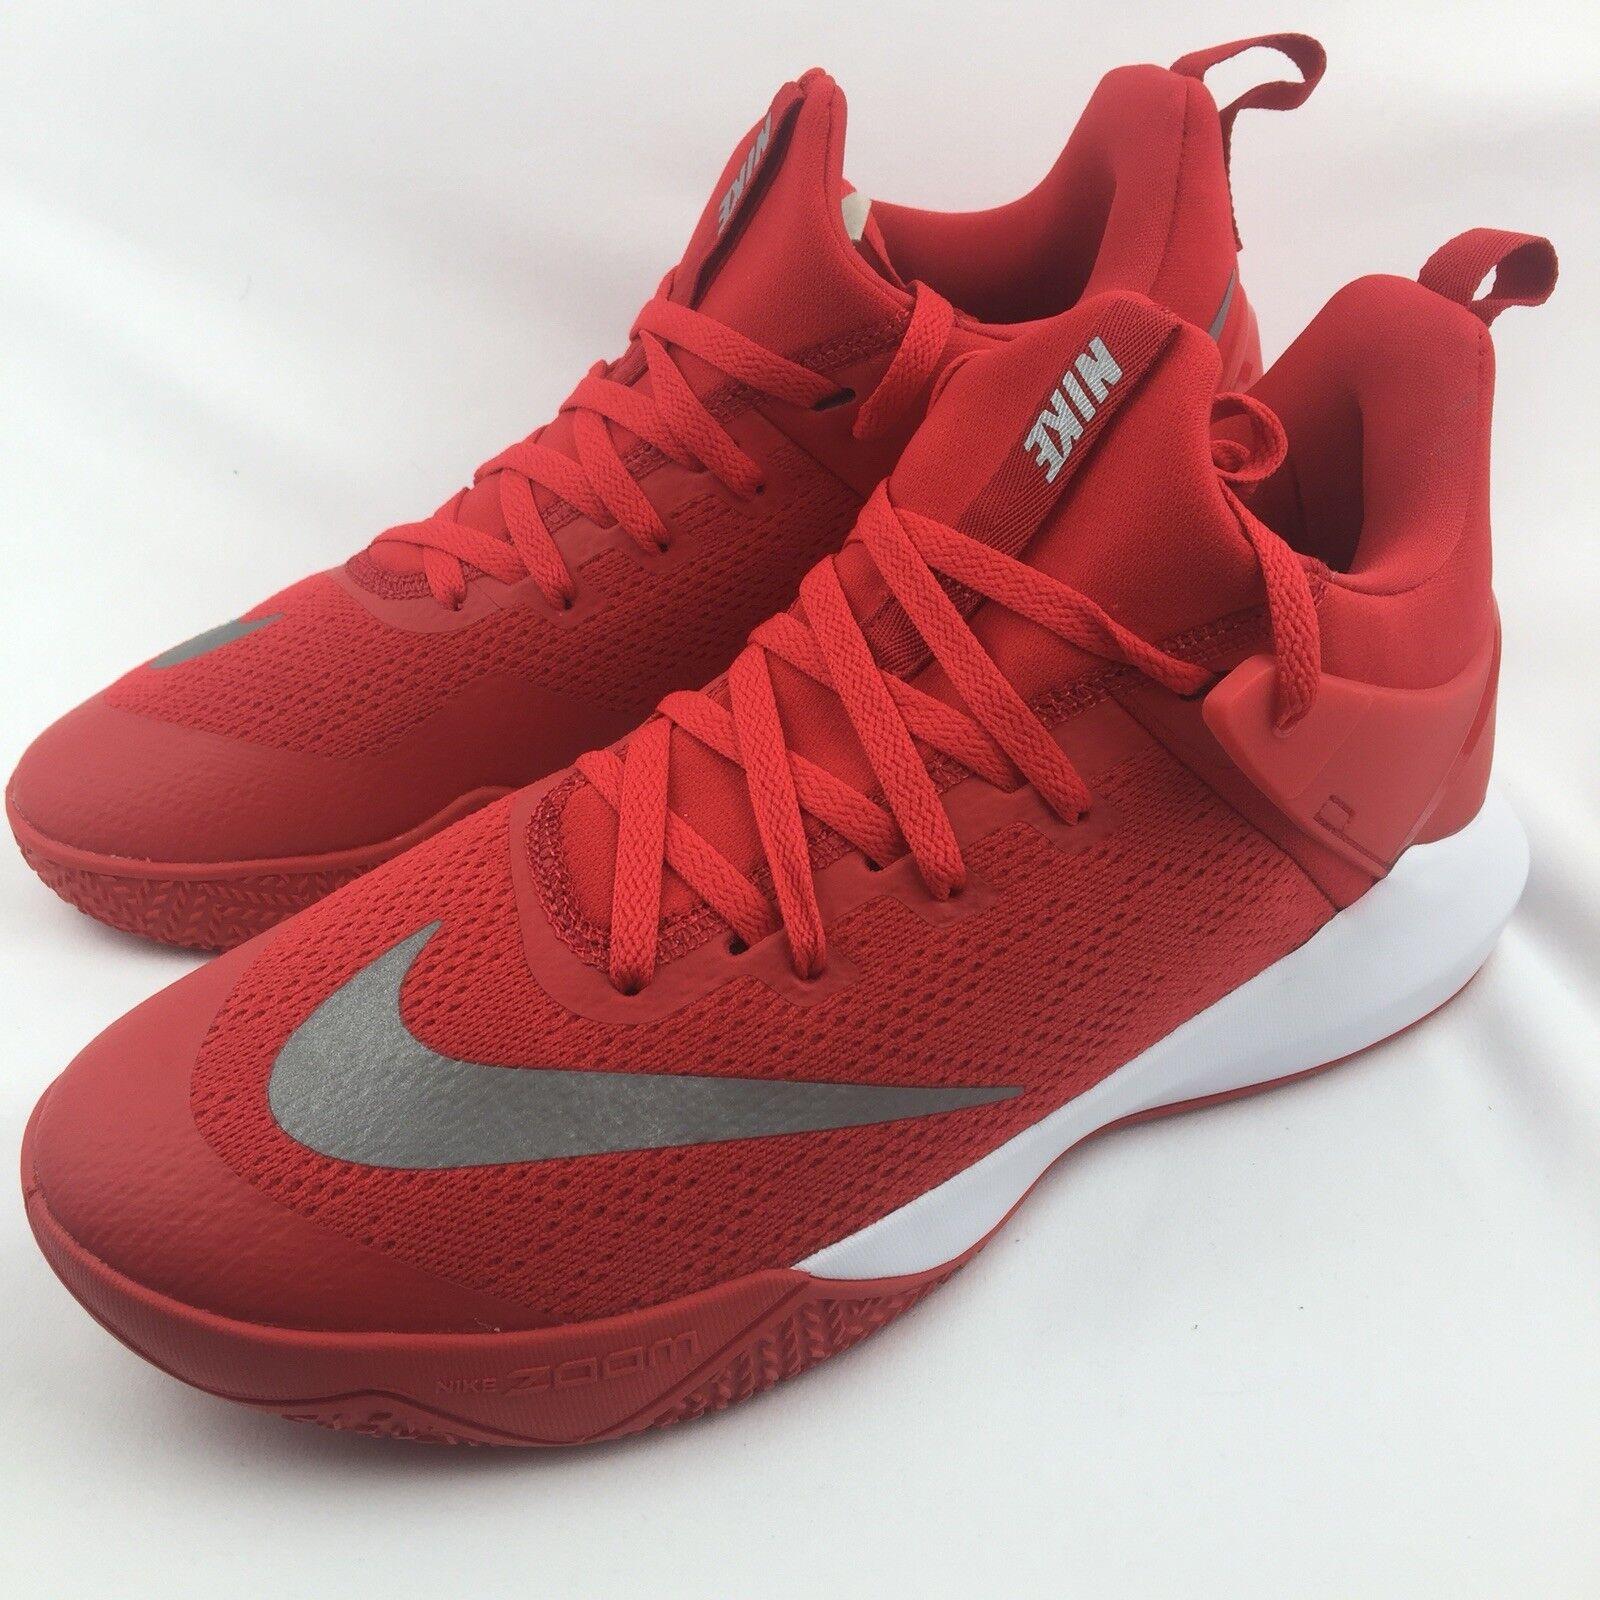 Nike Zoom Shift TB 897811-600 University Red White Size 12